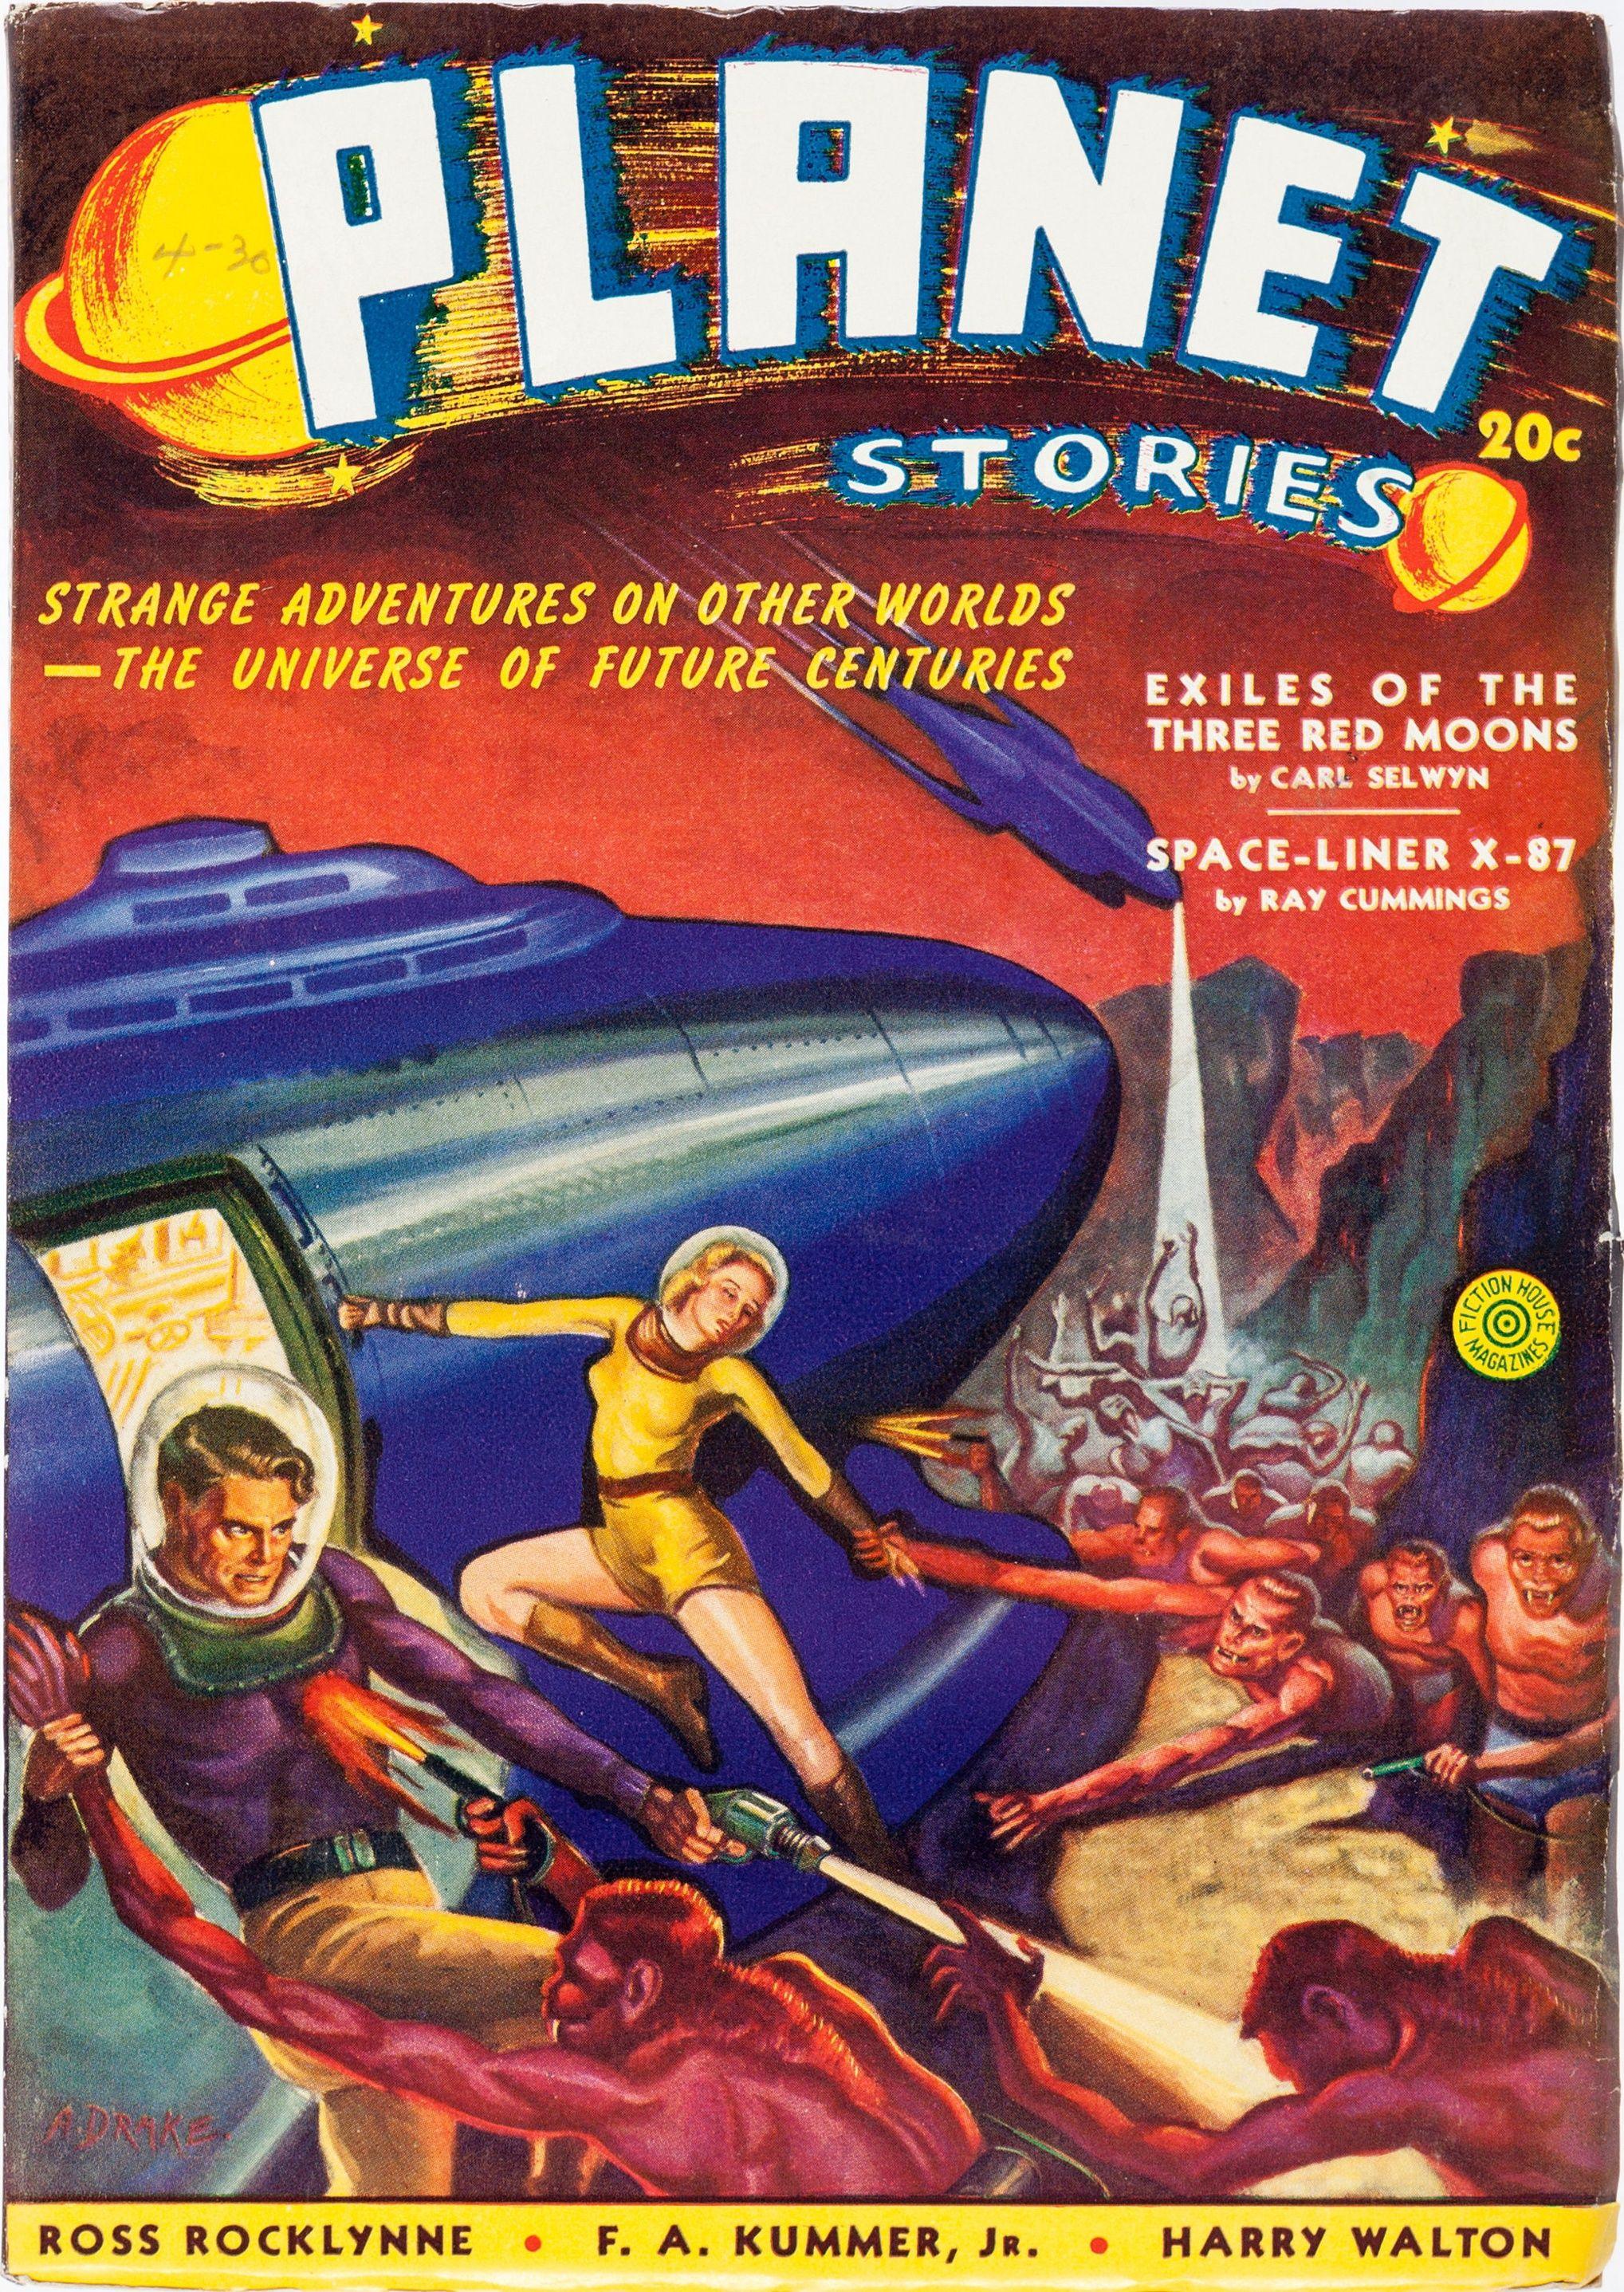 Albert Drake Exiles of the Three Red Moons Planet Stories, Vol. 1 nº 3; Summer 1940.  #AlbertDrake #PulpArt #PlanetStories #SciFi